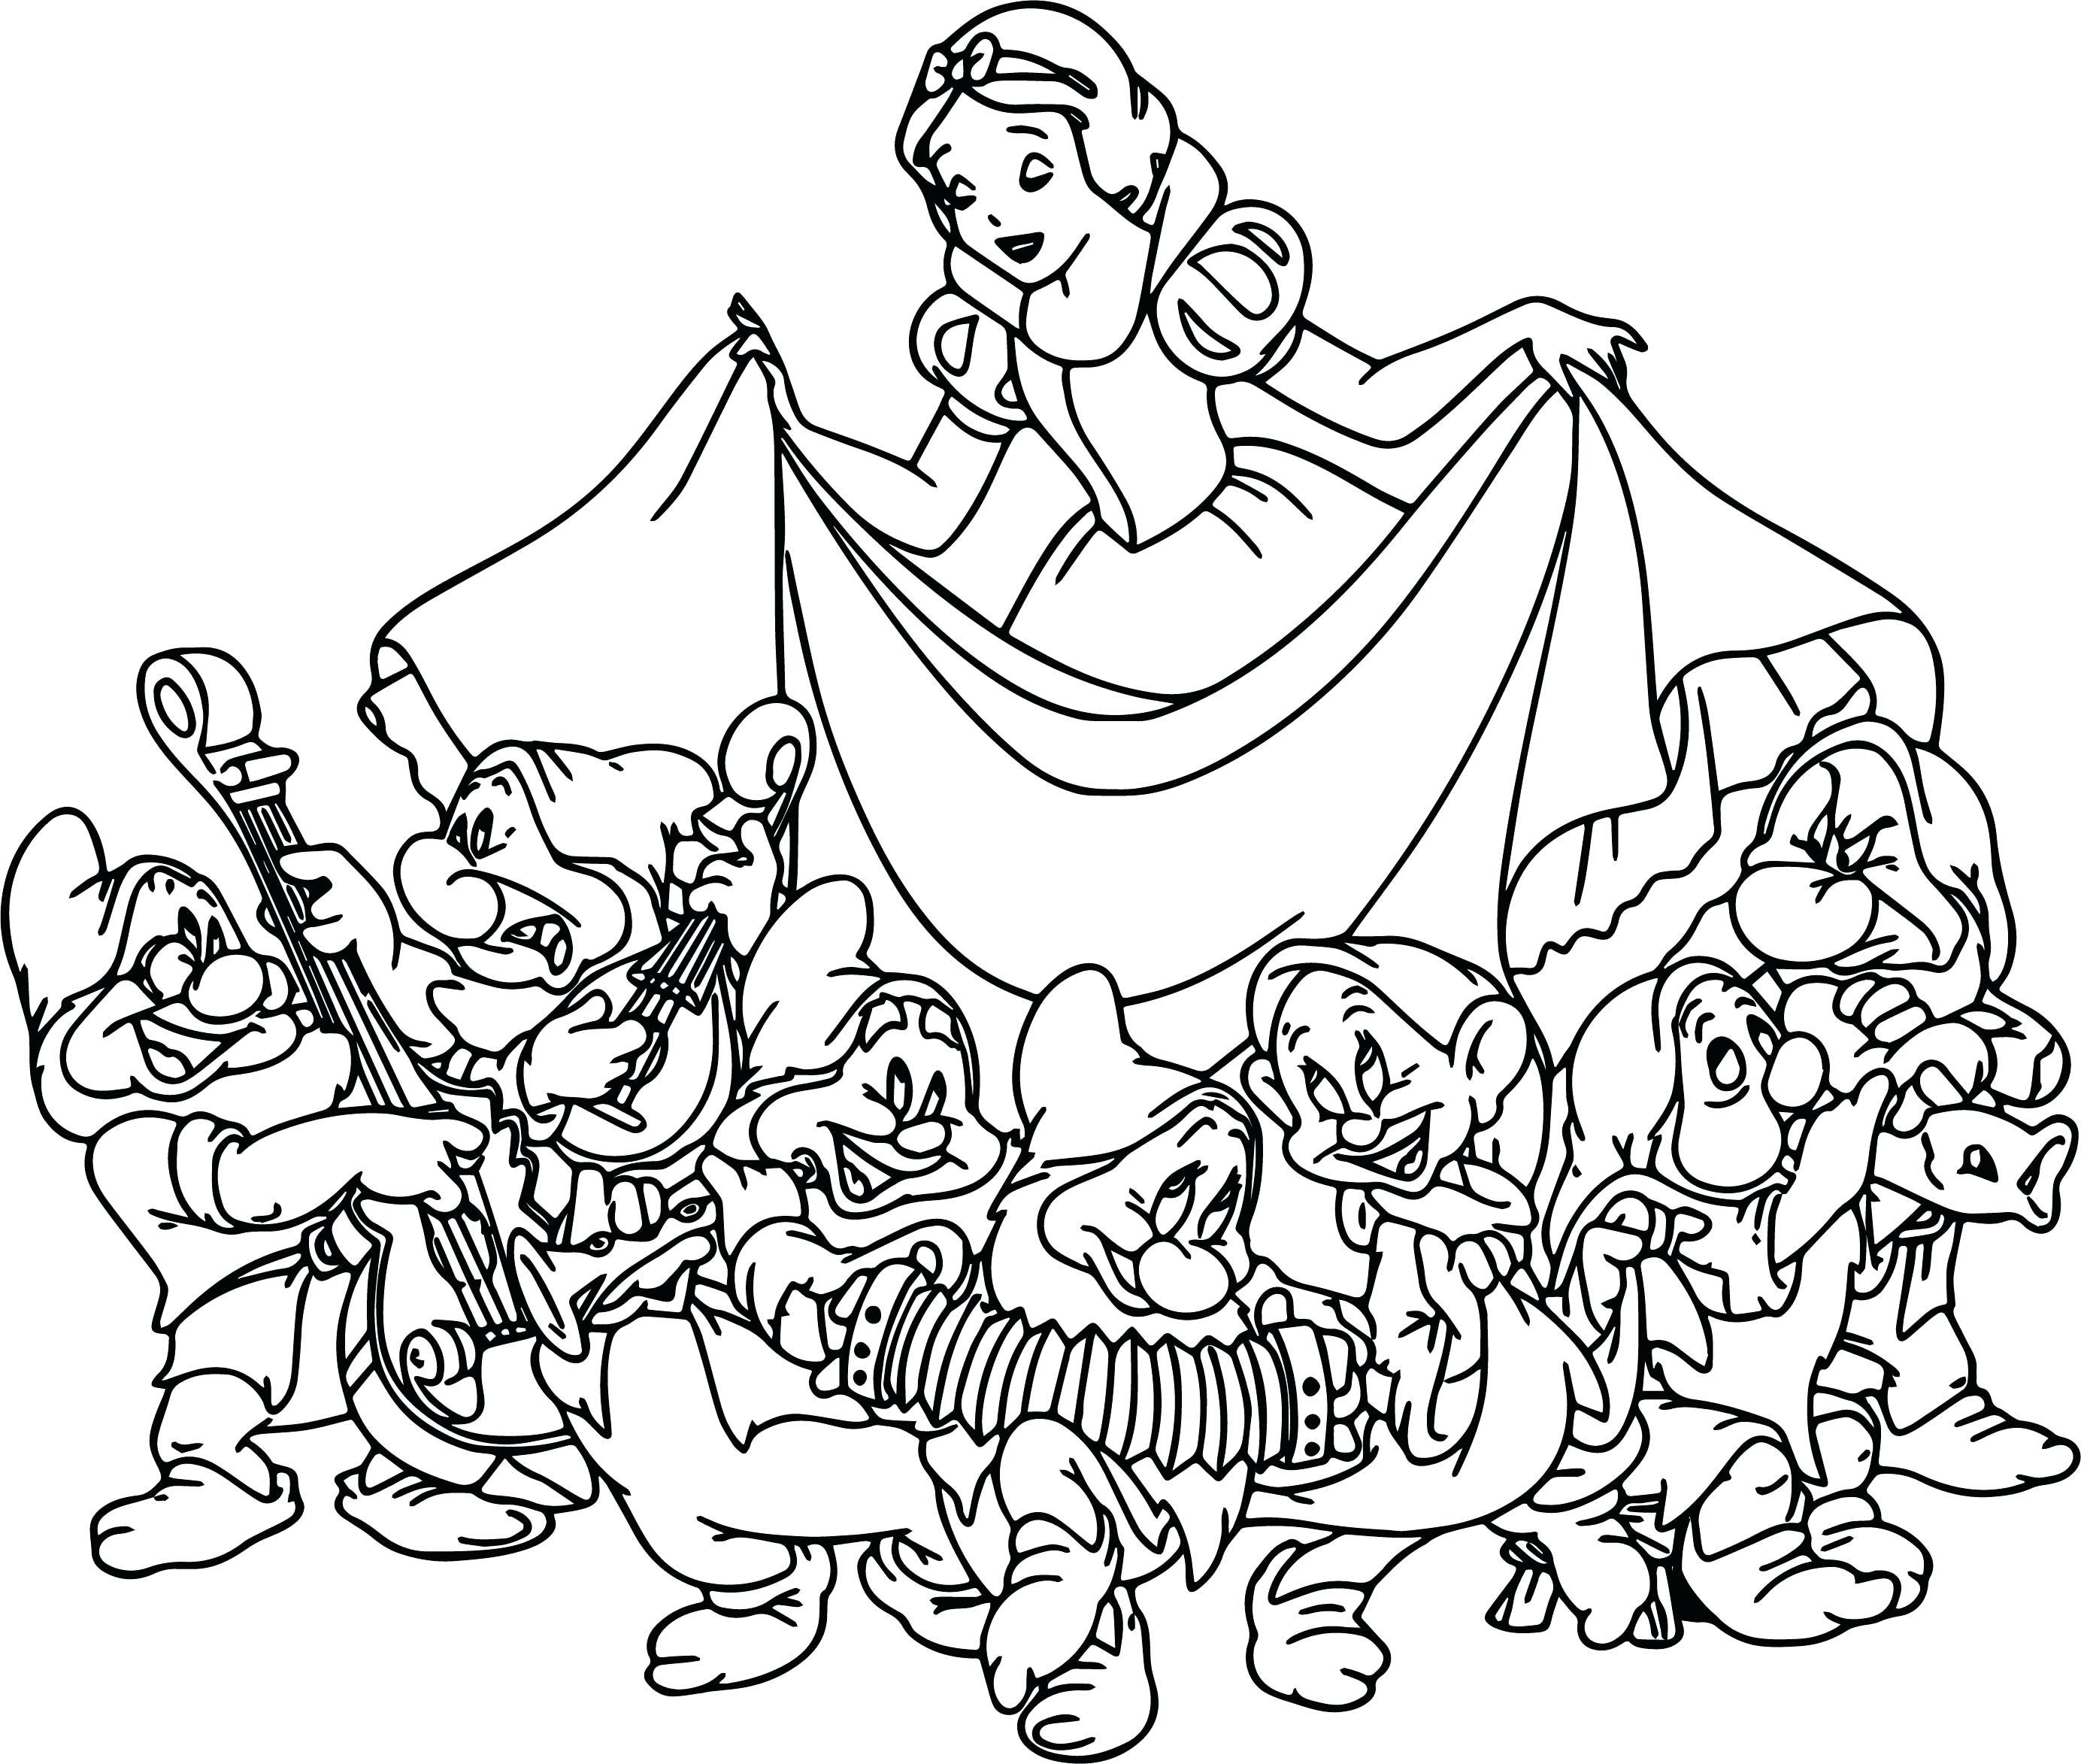 Black and white clipart seven dwarfs image transparent stock 7 Dwarfs Coloring Pages   Free download best 7 Dwarfs Coloring Pages ... image transparent stock